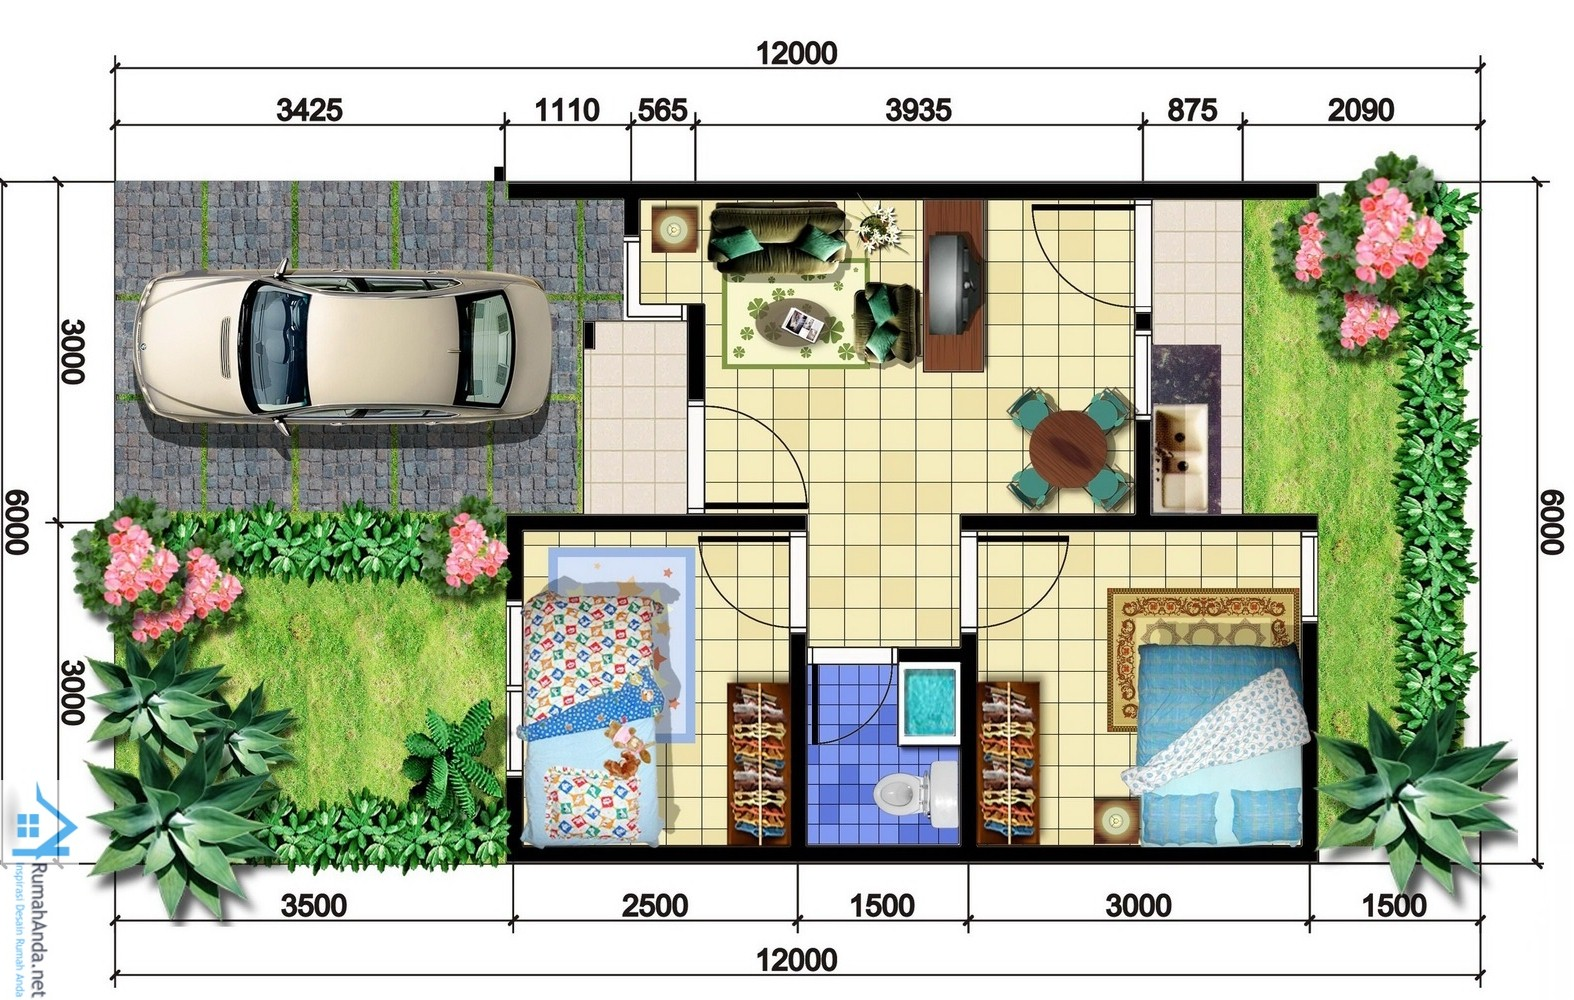 Rumah Minimalis 1 Lantai Ukuran 7x9 Dshdesign4kinfo